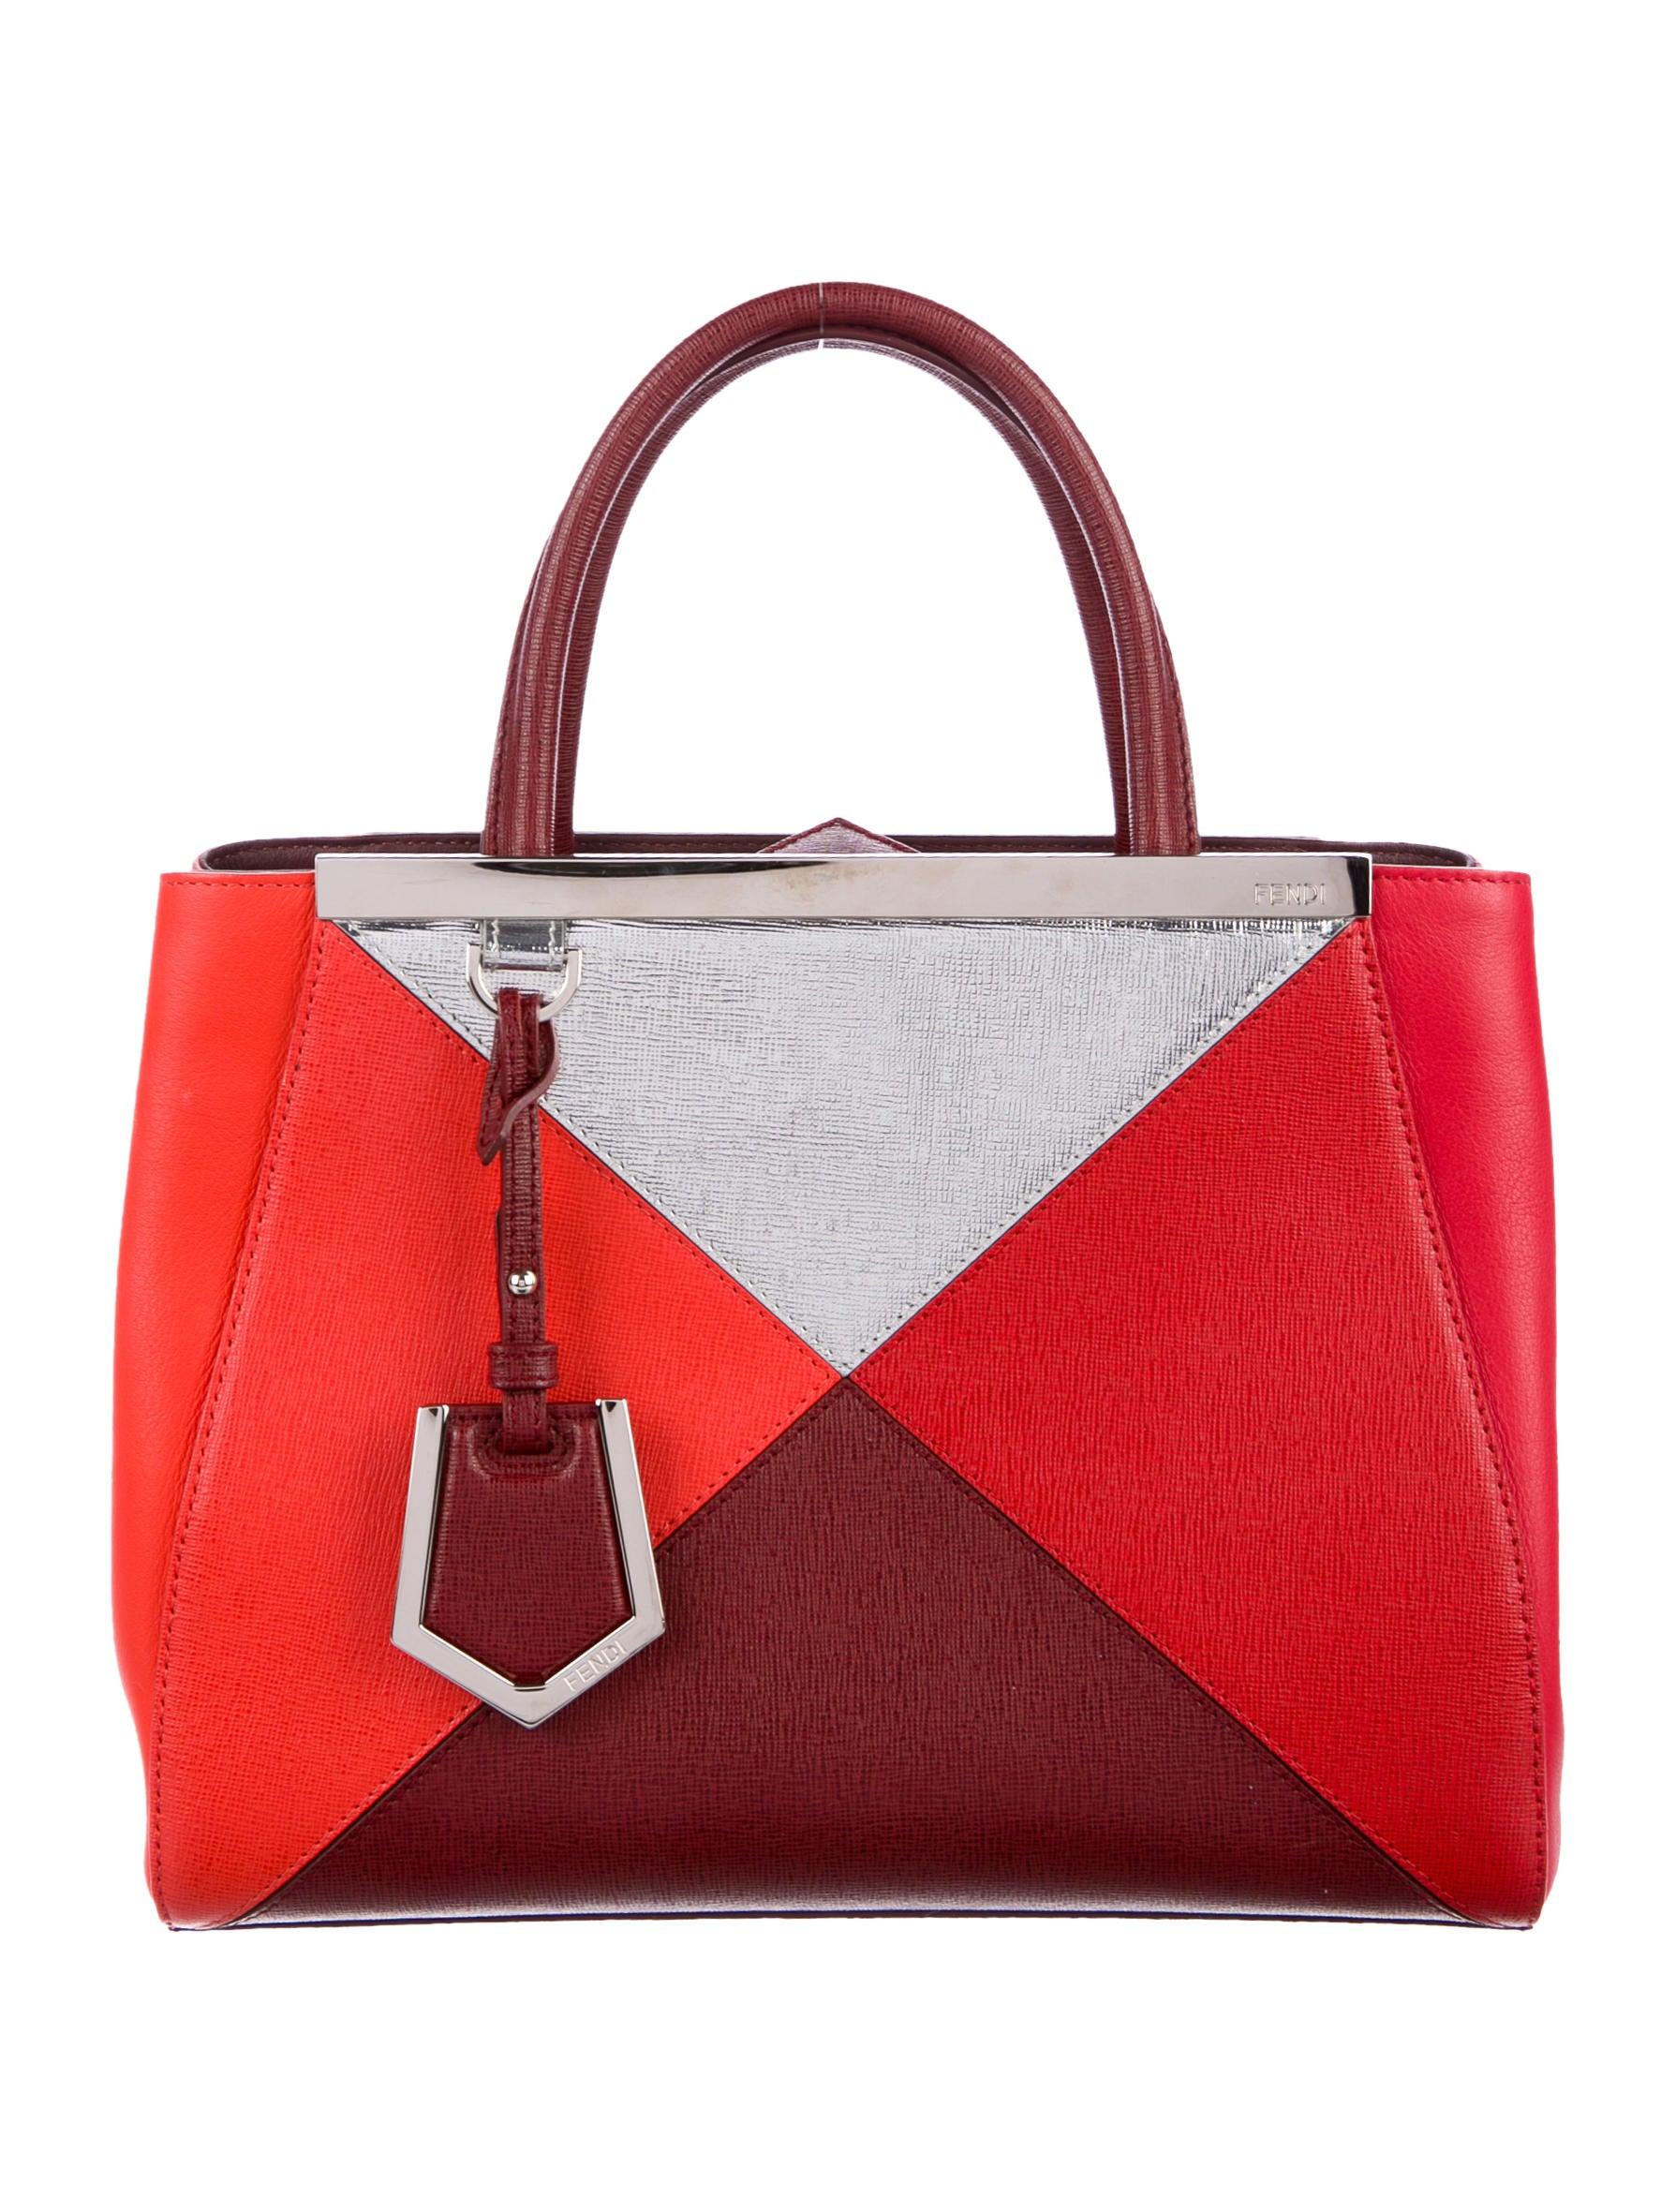 5fd97575835 Fendi Petite 2Jours Tote - Handbags - FEN65738 | The RealReal